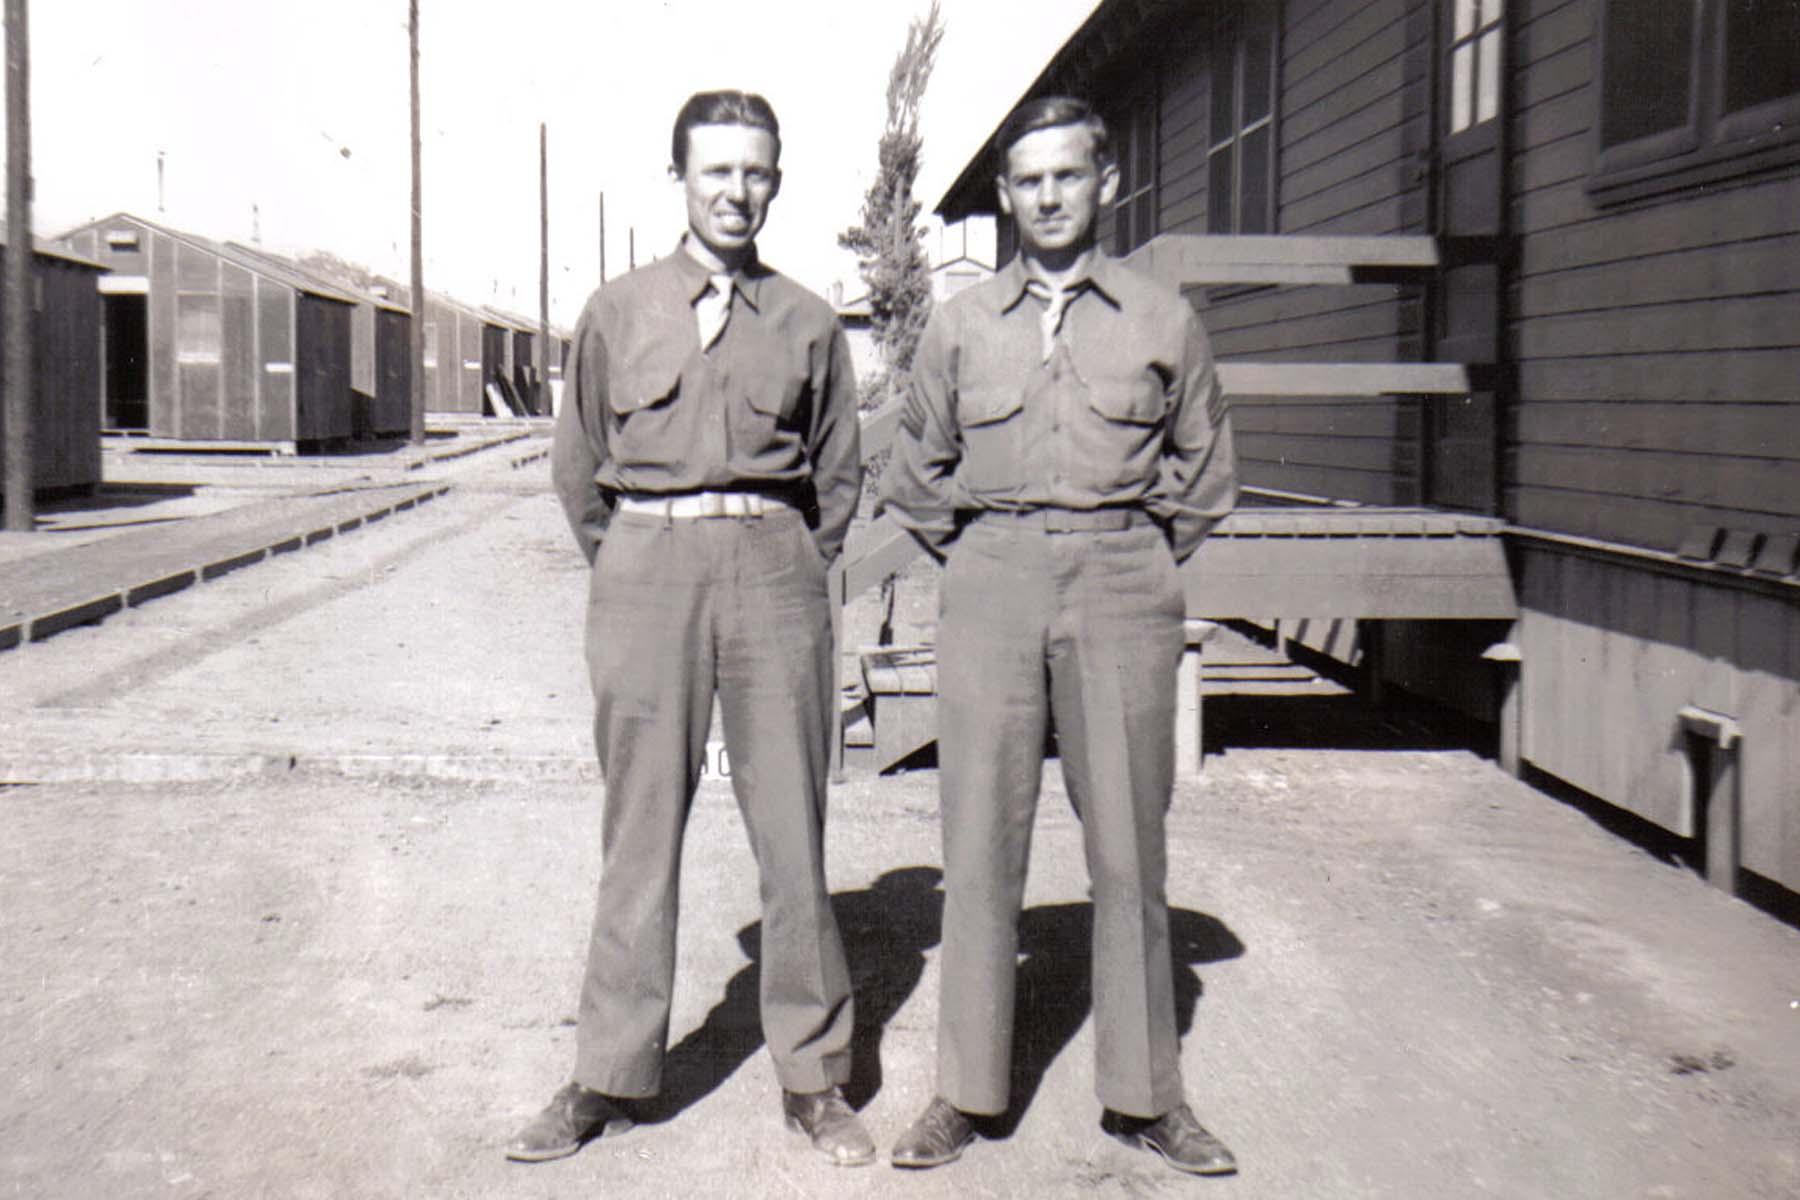 C04 Camp San Luis Obispo - Earl Miller _L_ and Tom Fallen